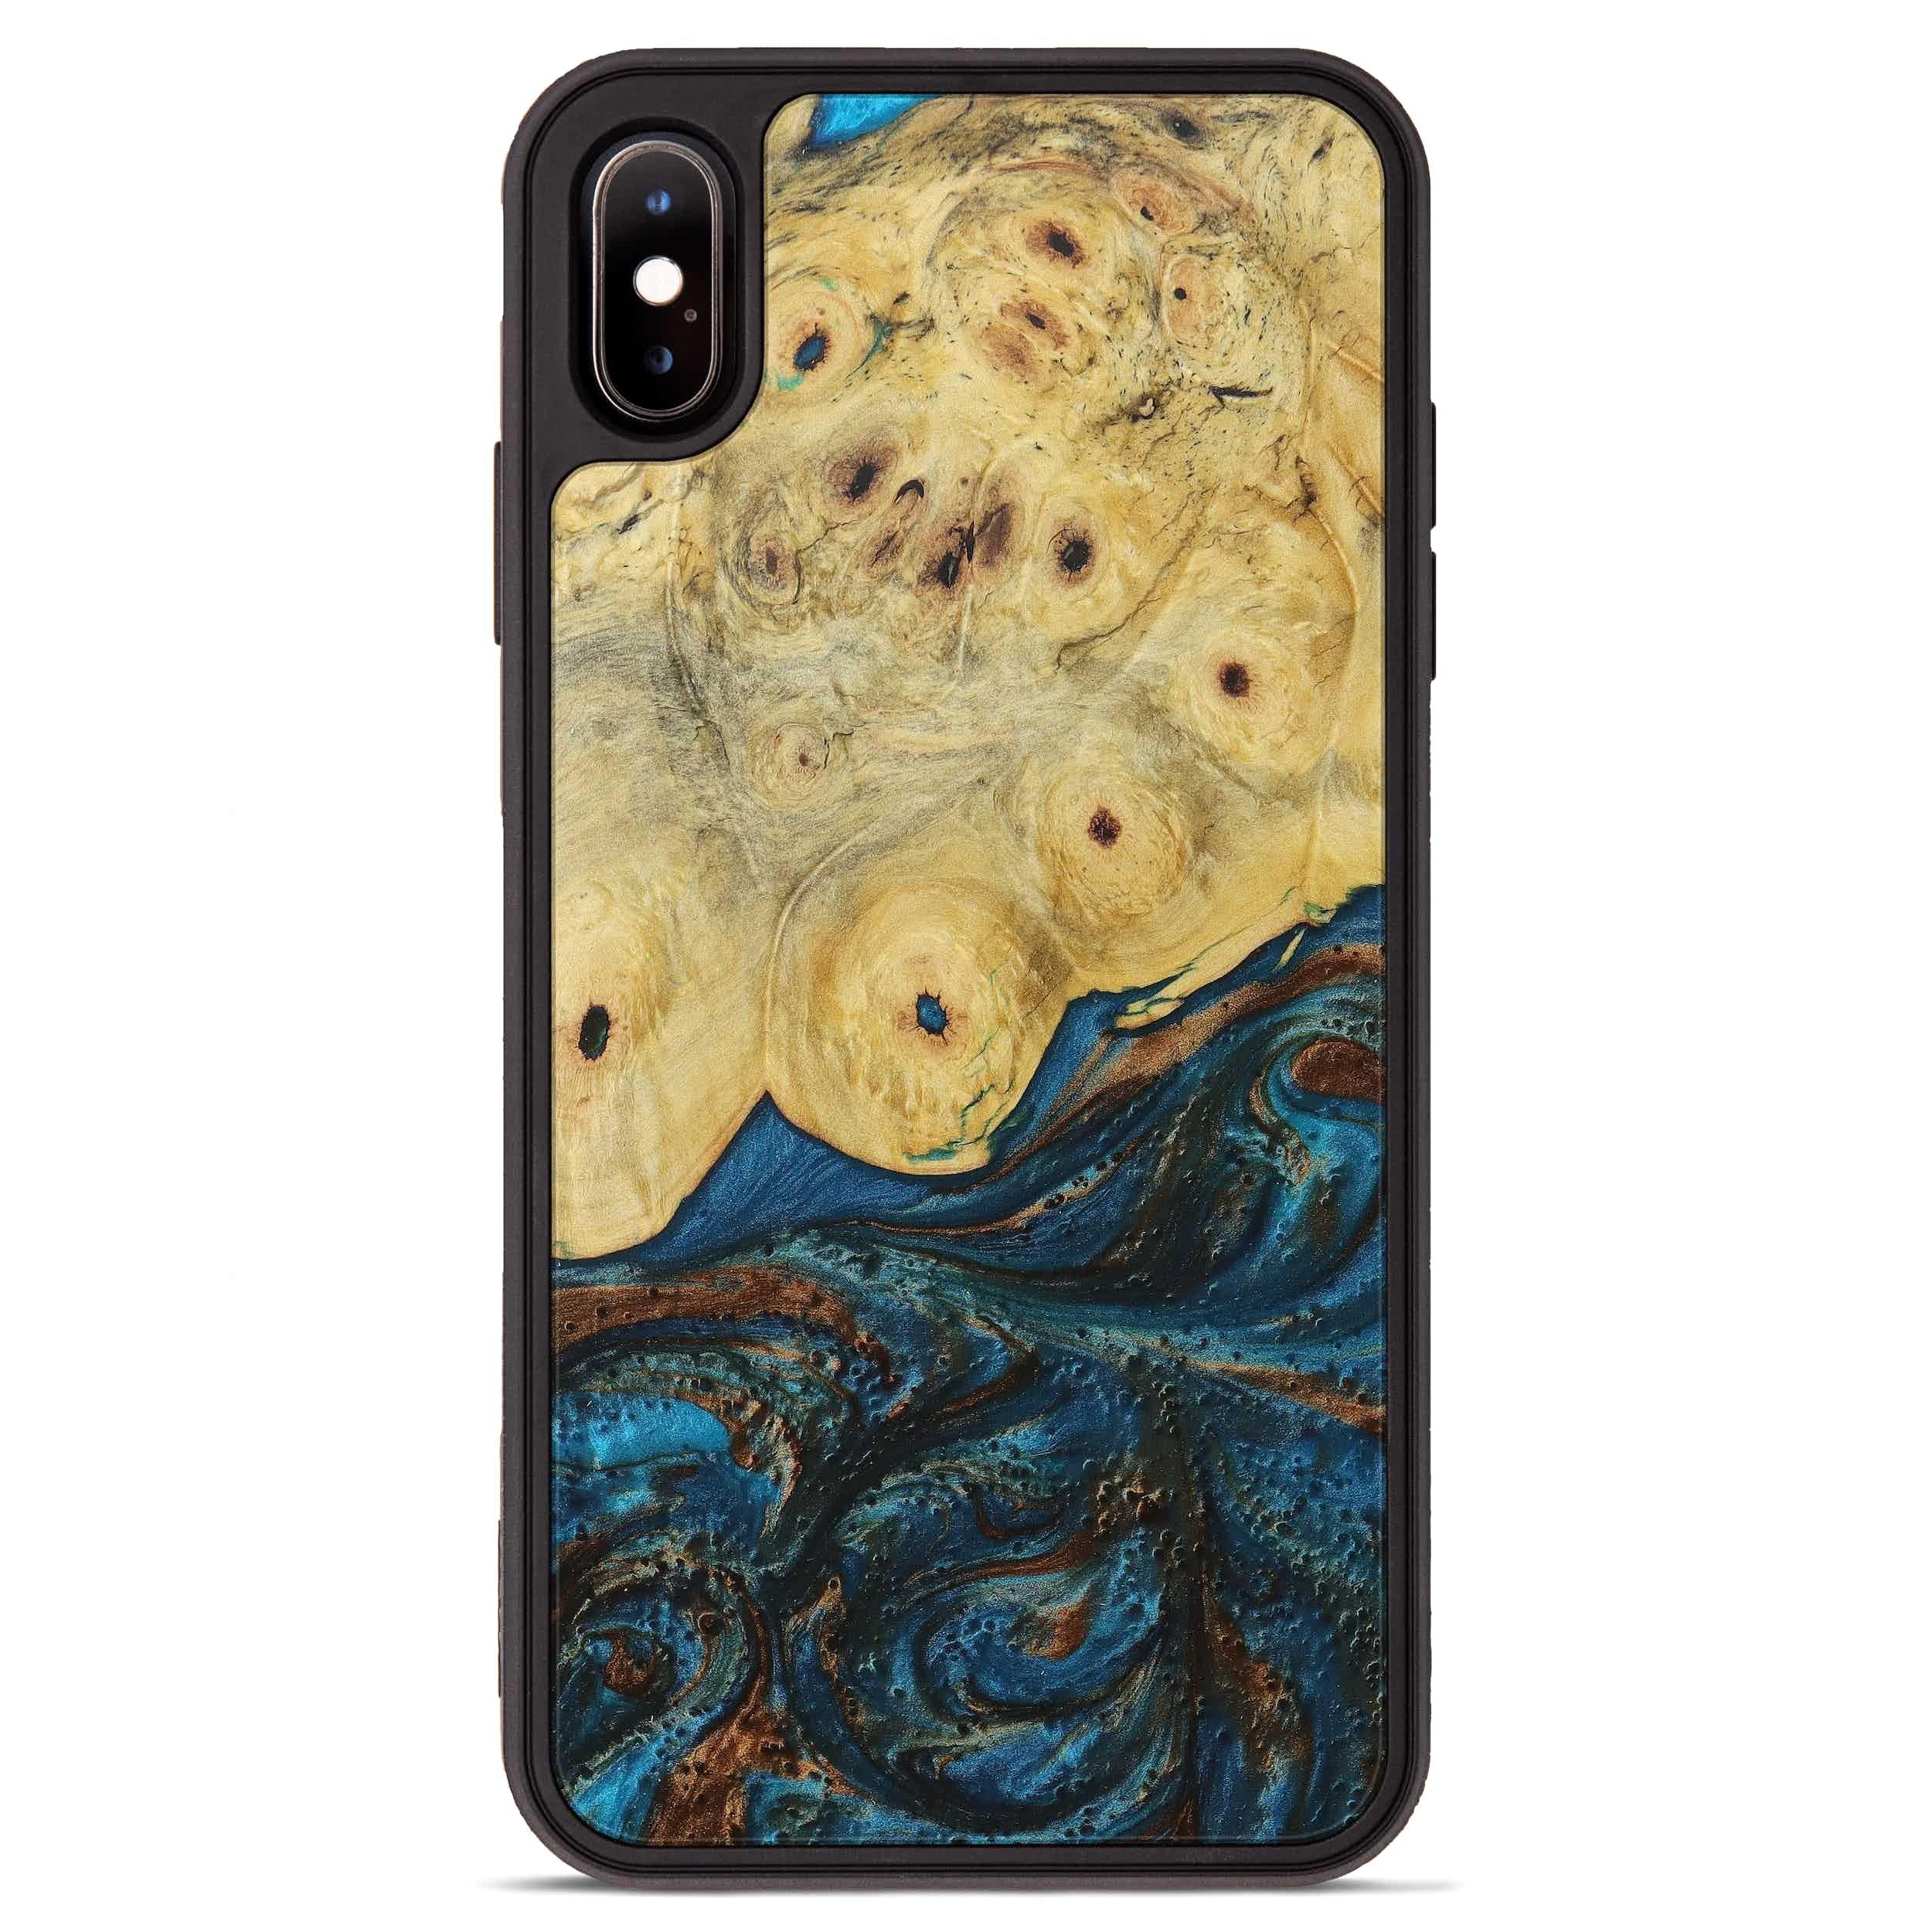 iPhone Xs Max Wood+Resin Phone Case - Mats (Teal & Gold, 394367)